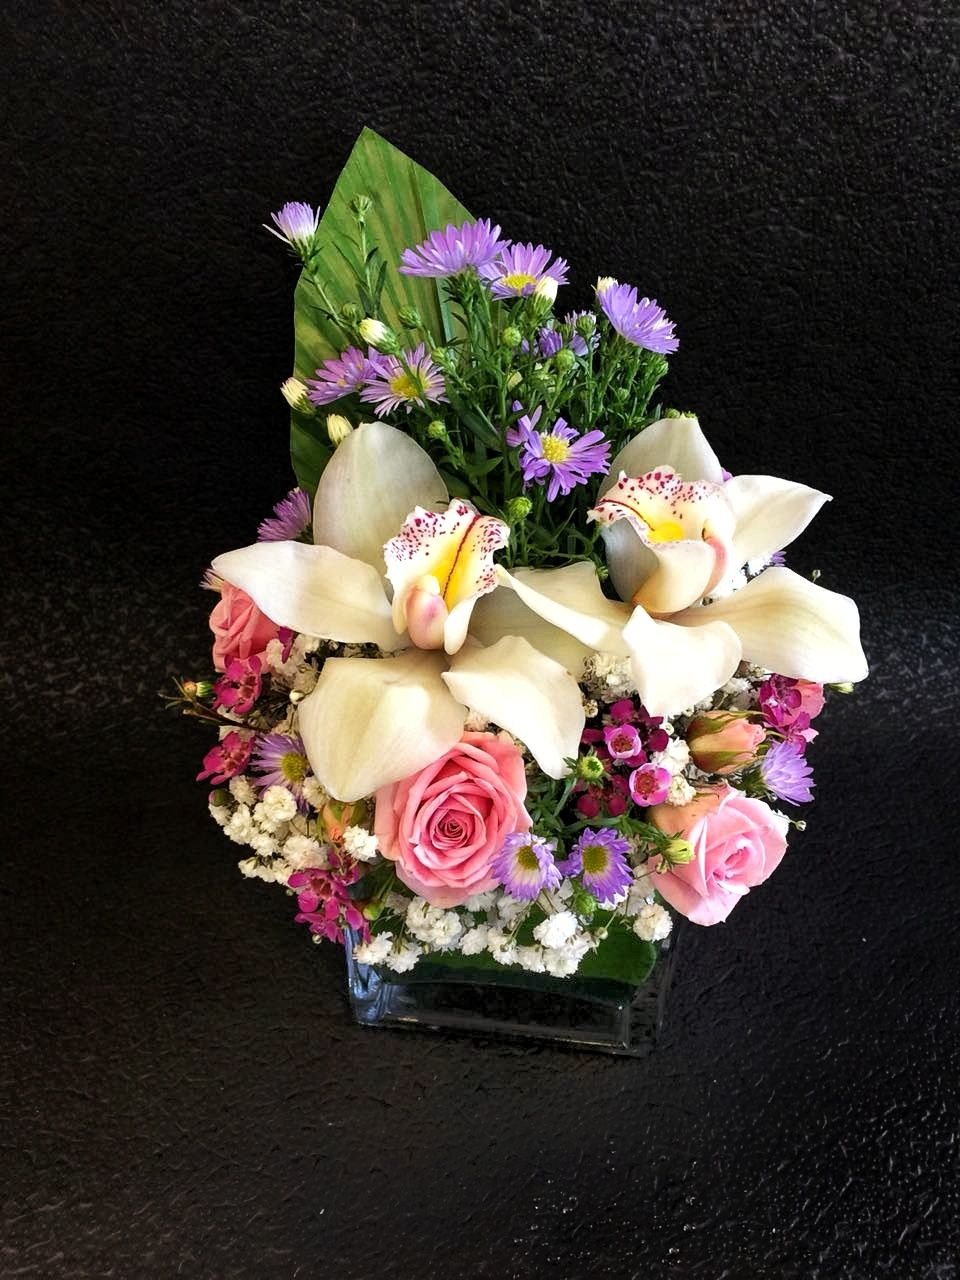 Choiceflowersuaeglistening Beauty Shining Flowers Flowerstagram Flowerbouquet Abudhabiflorist Florist Auh Abudhabilif Composizioni Floreali Floreale